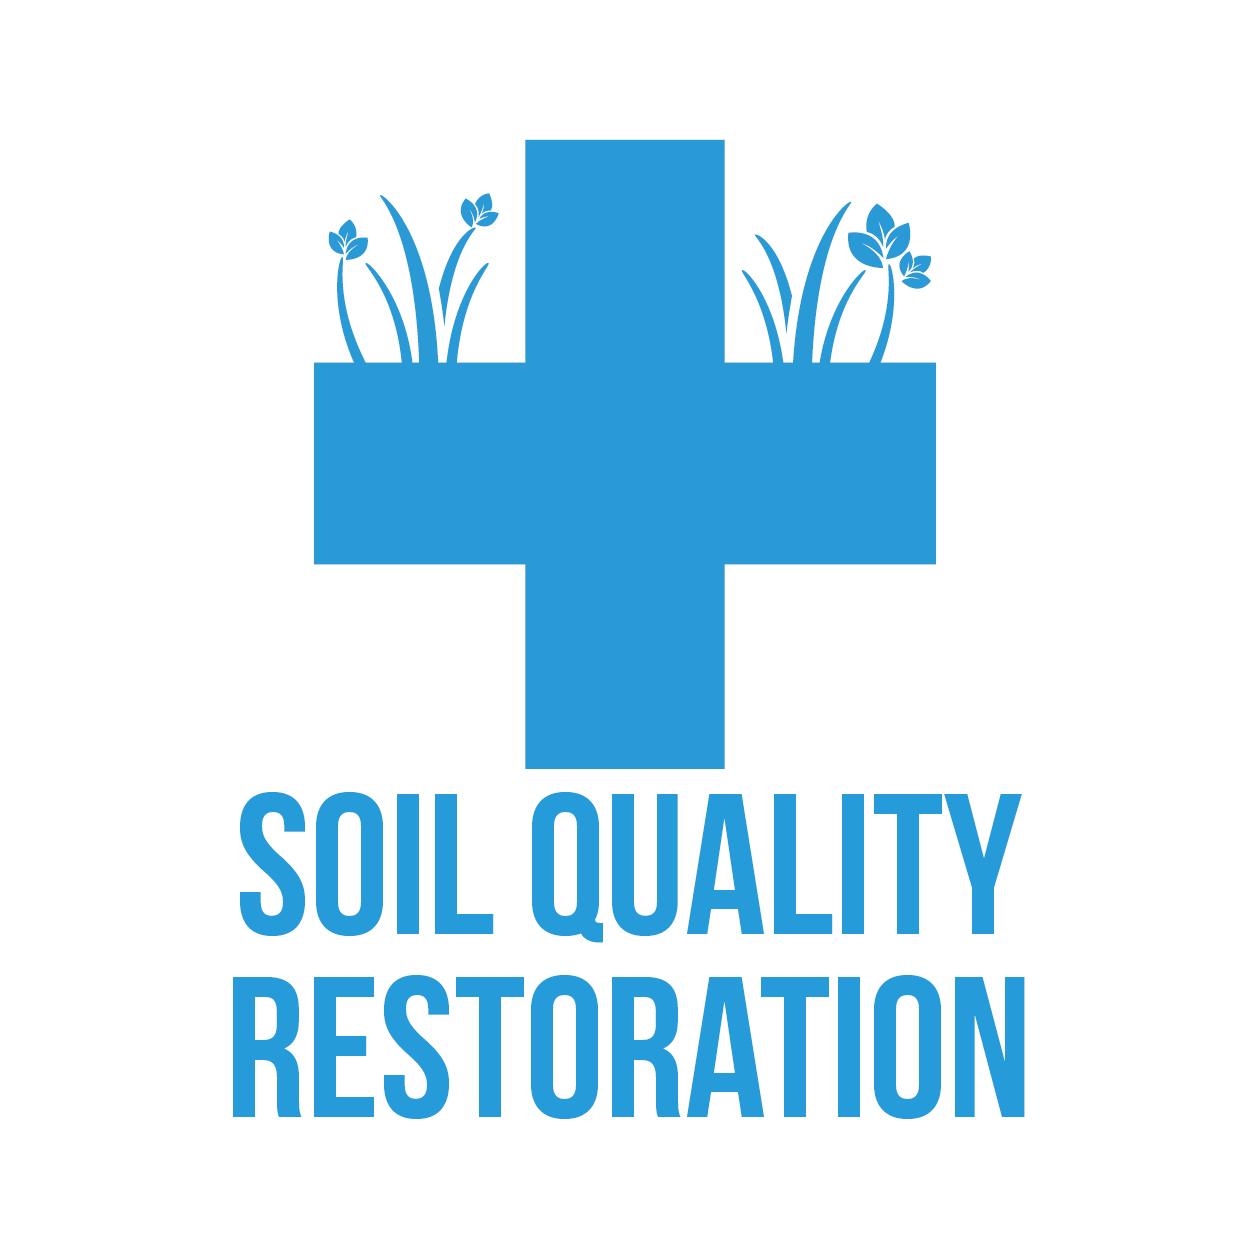 SOIL QUALITY RESTORATION